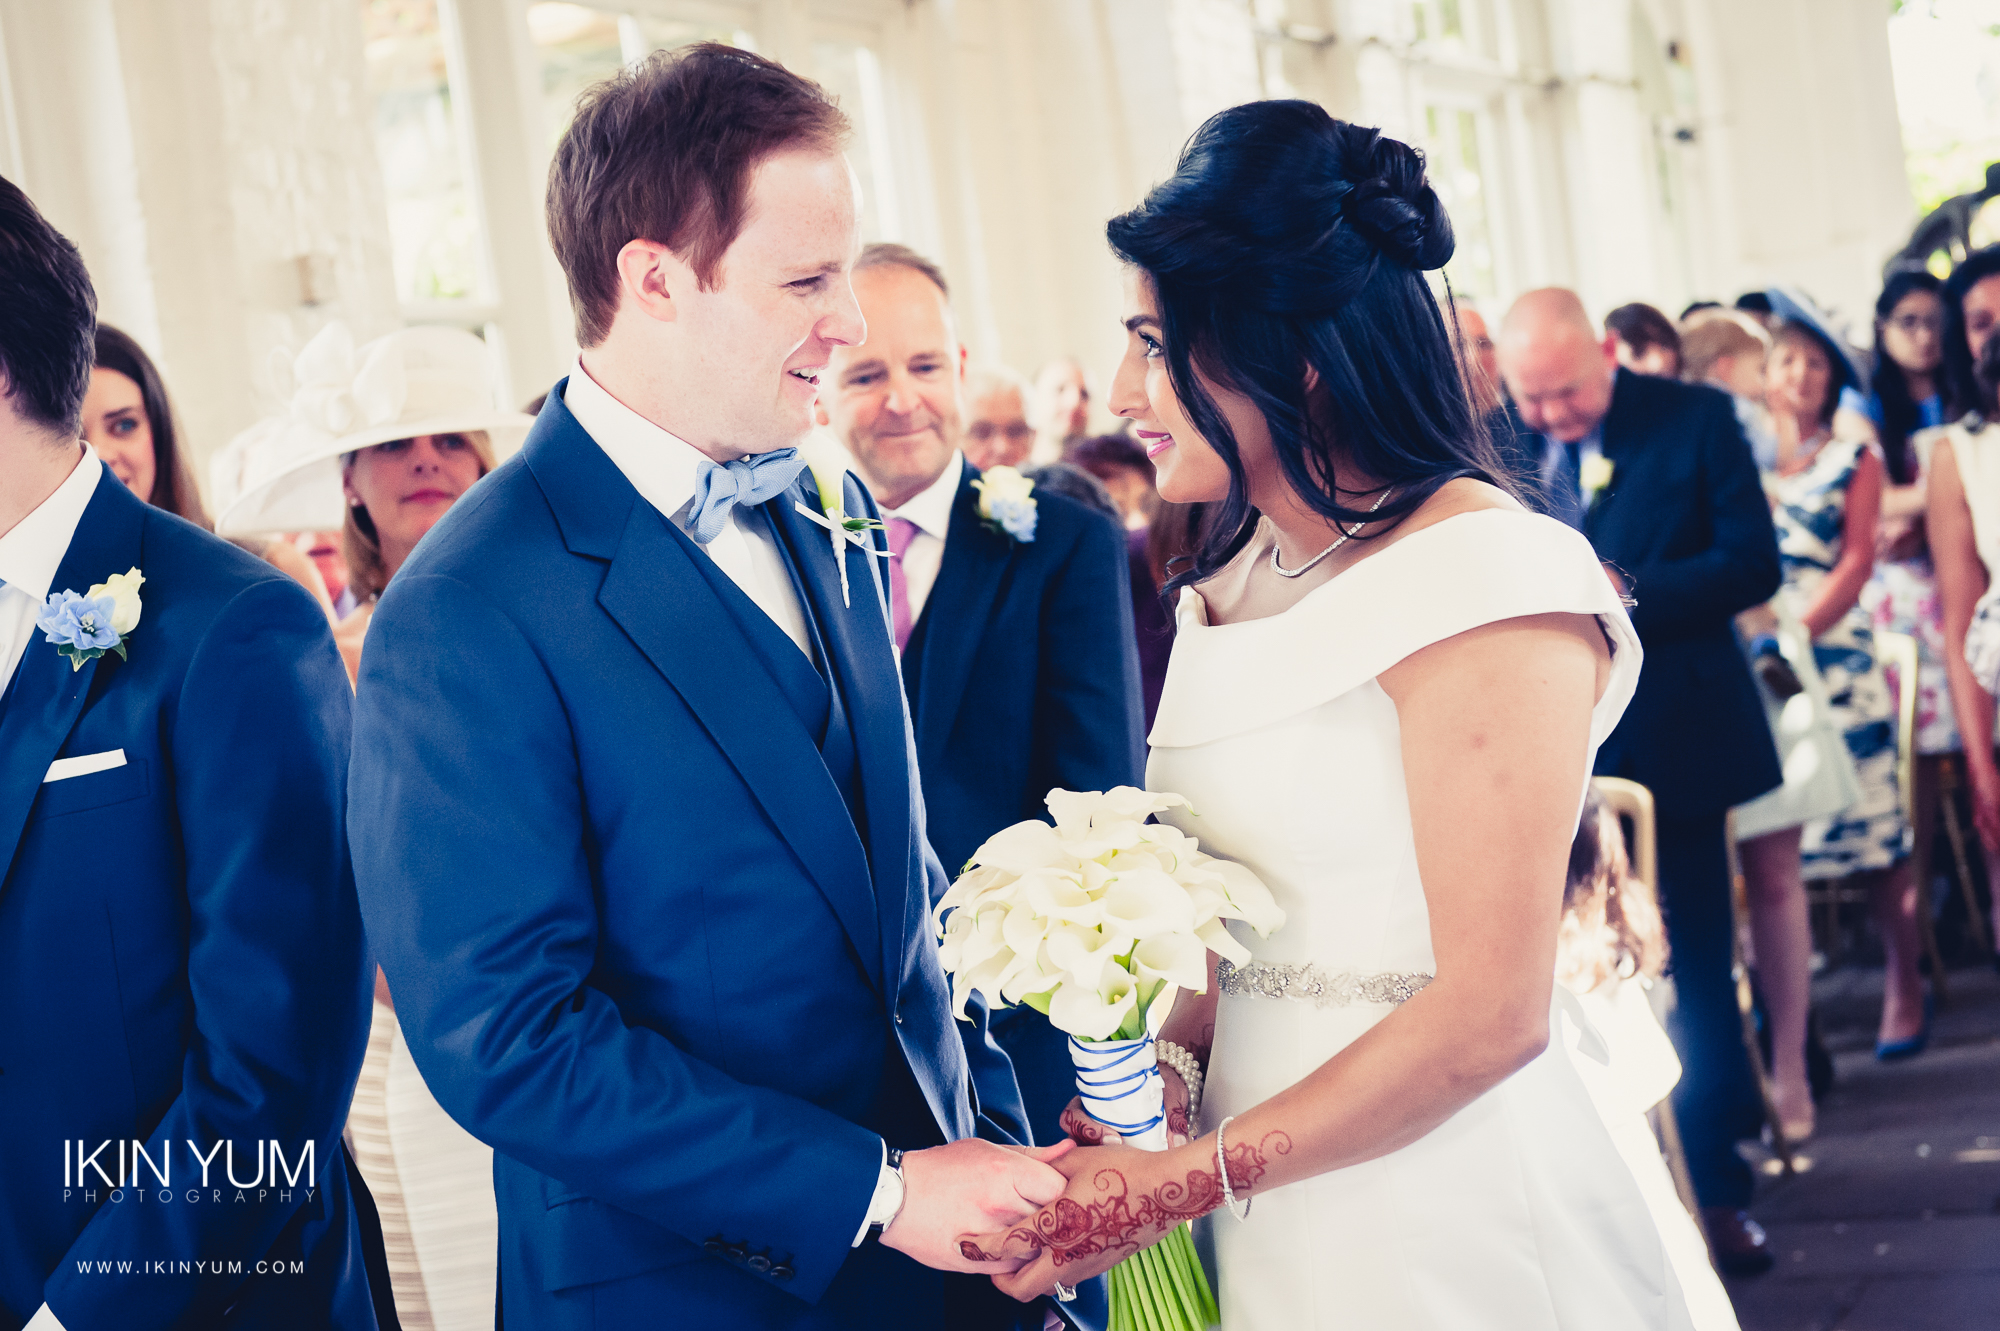 Holland Park Wedding - Ikin Yum Photography-0030.jpg